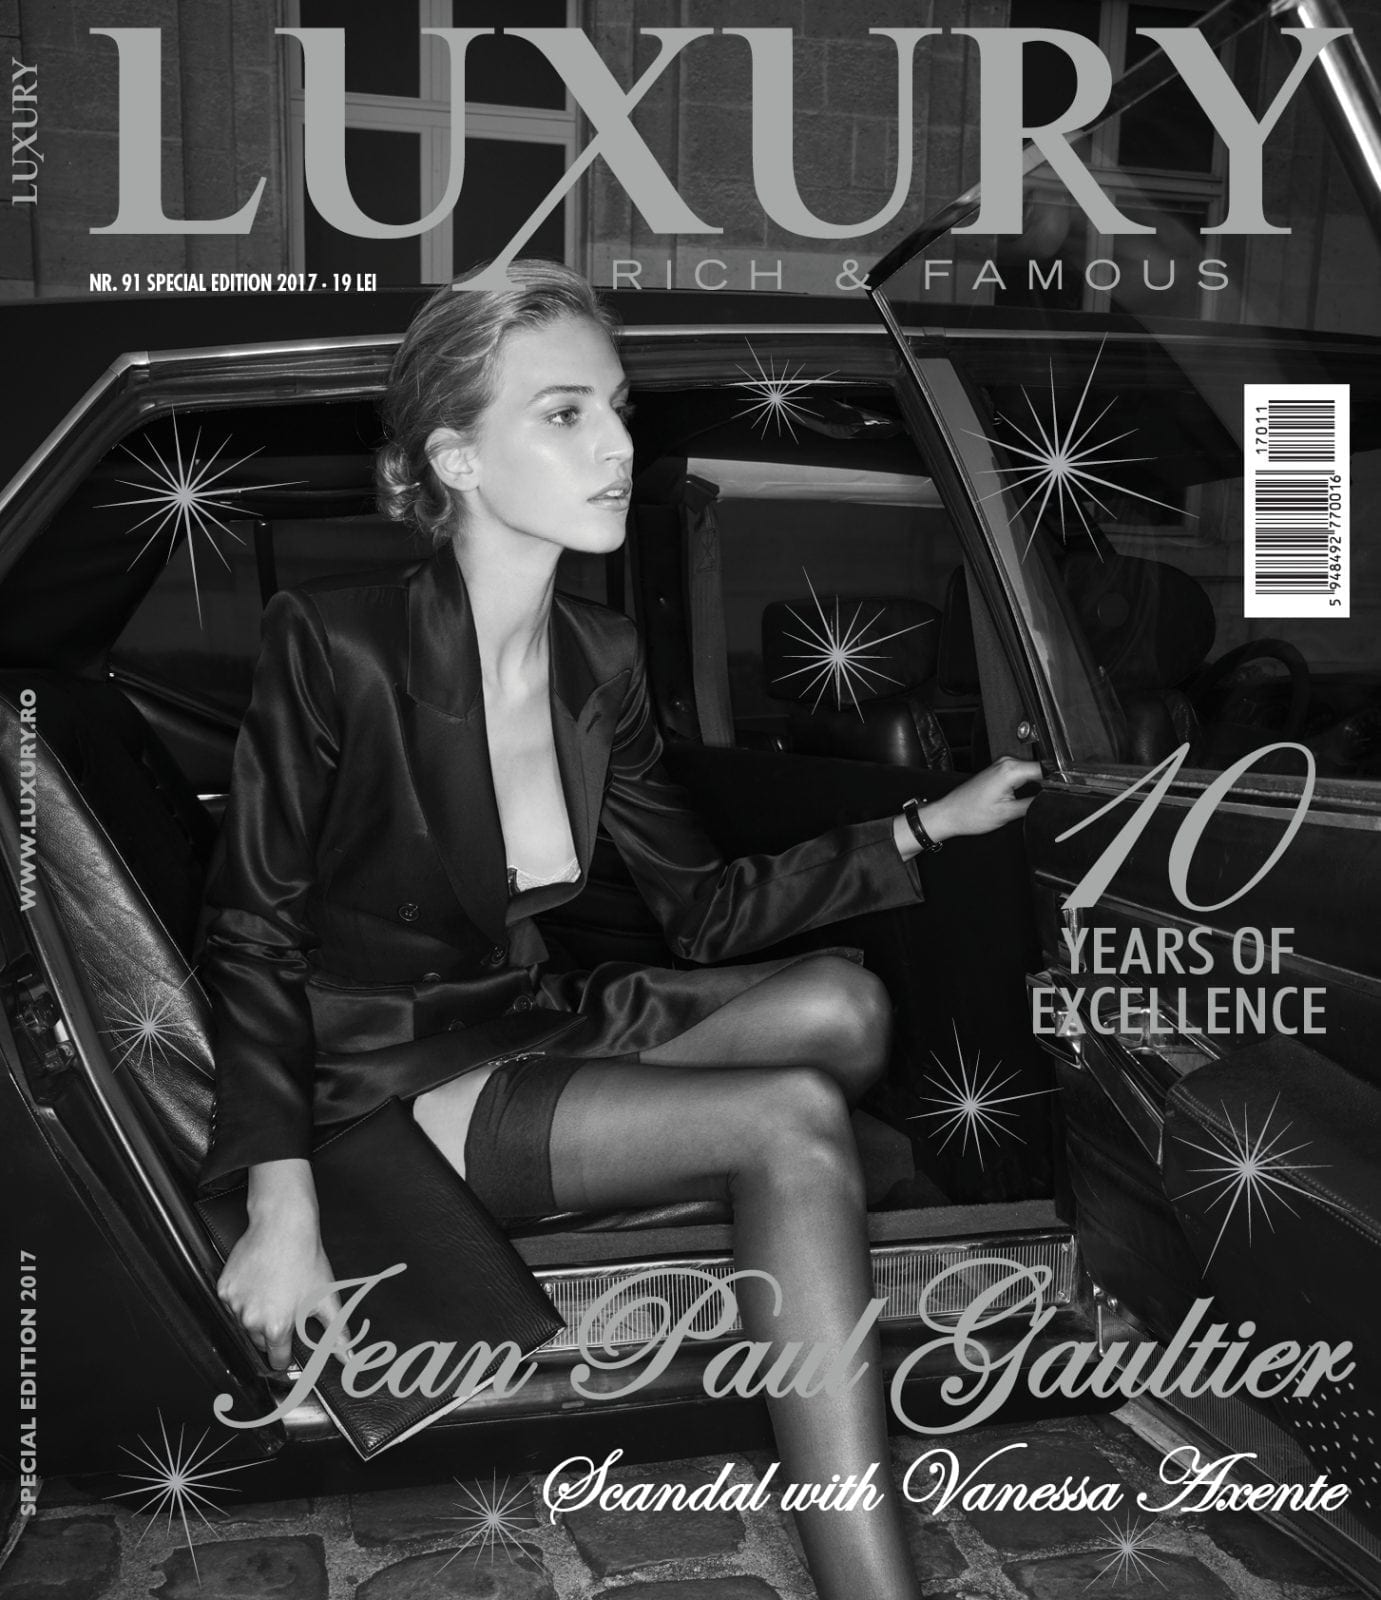 Jean Paul Gaultier with Vanessa Axente